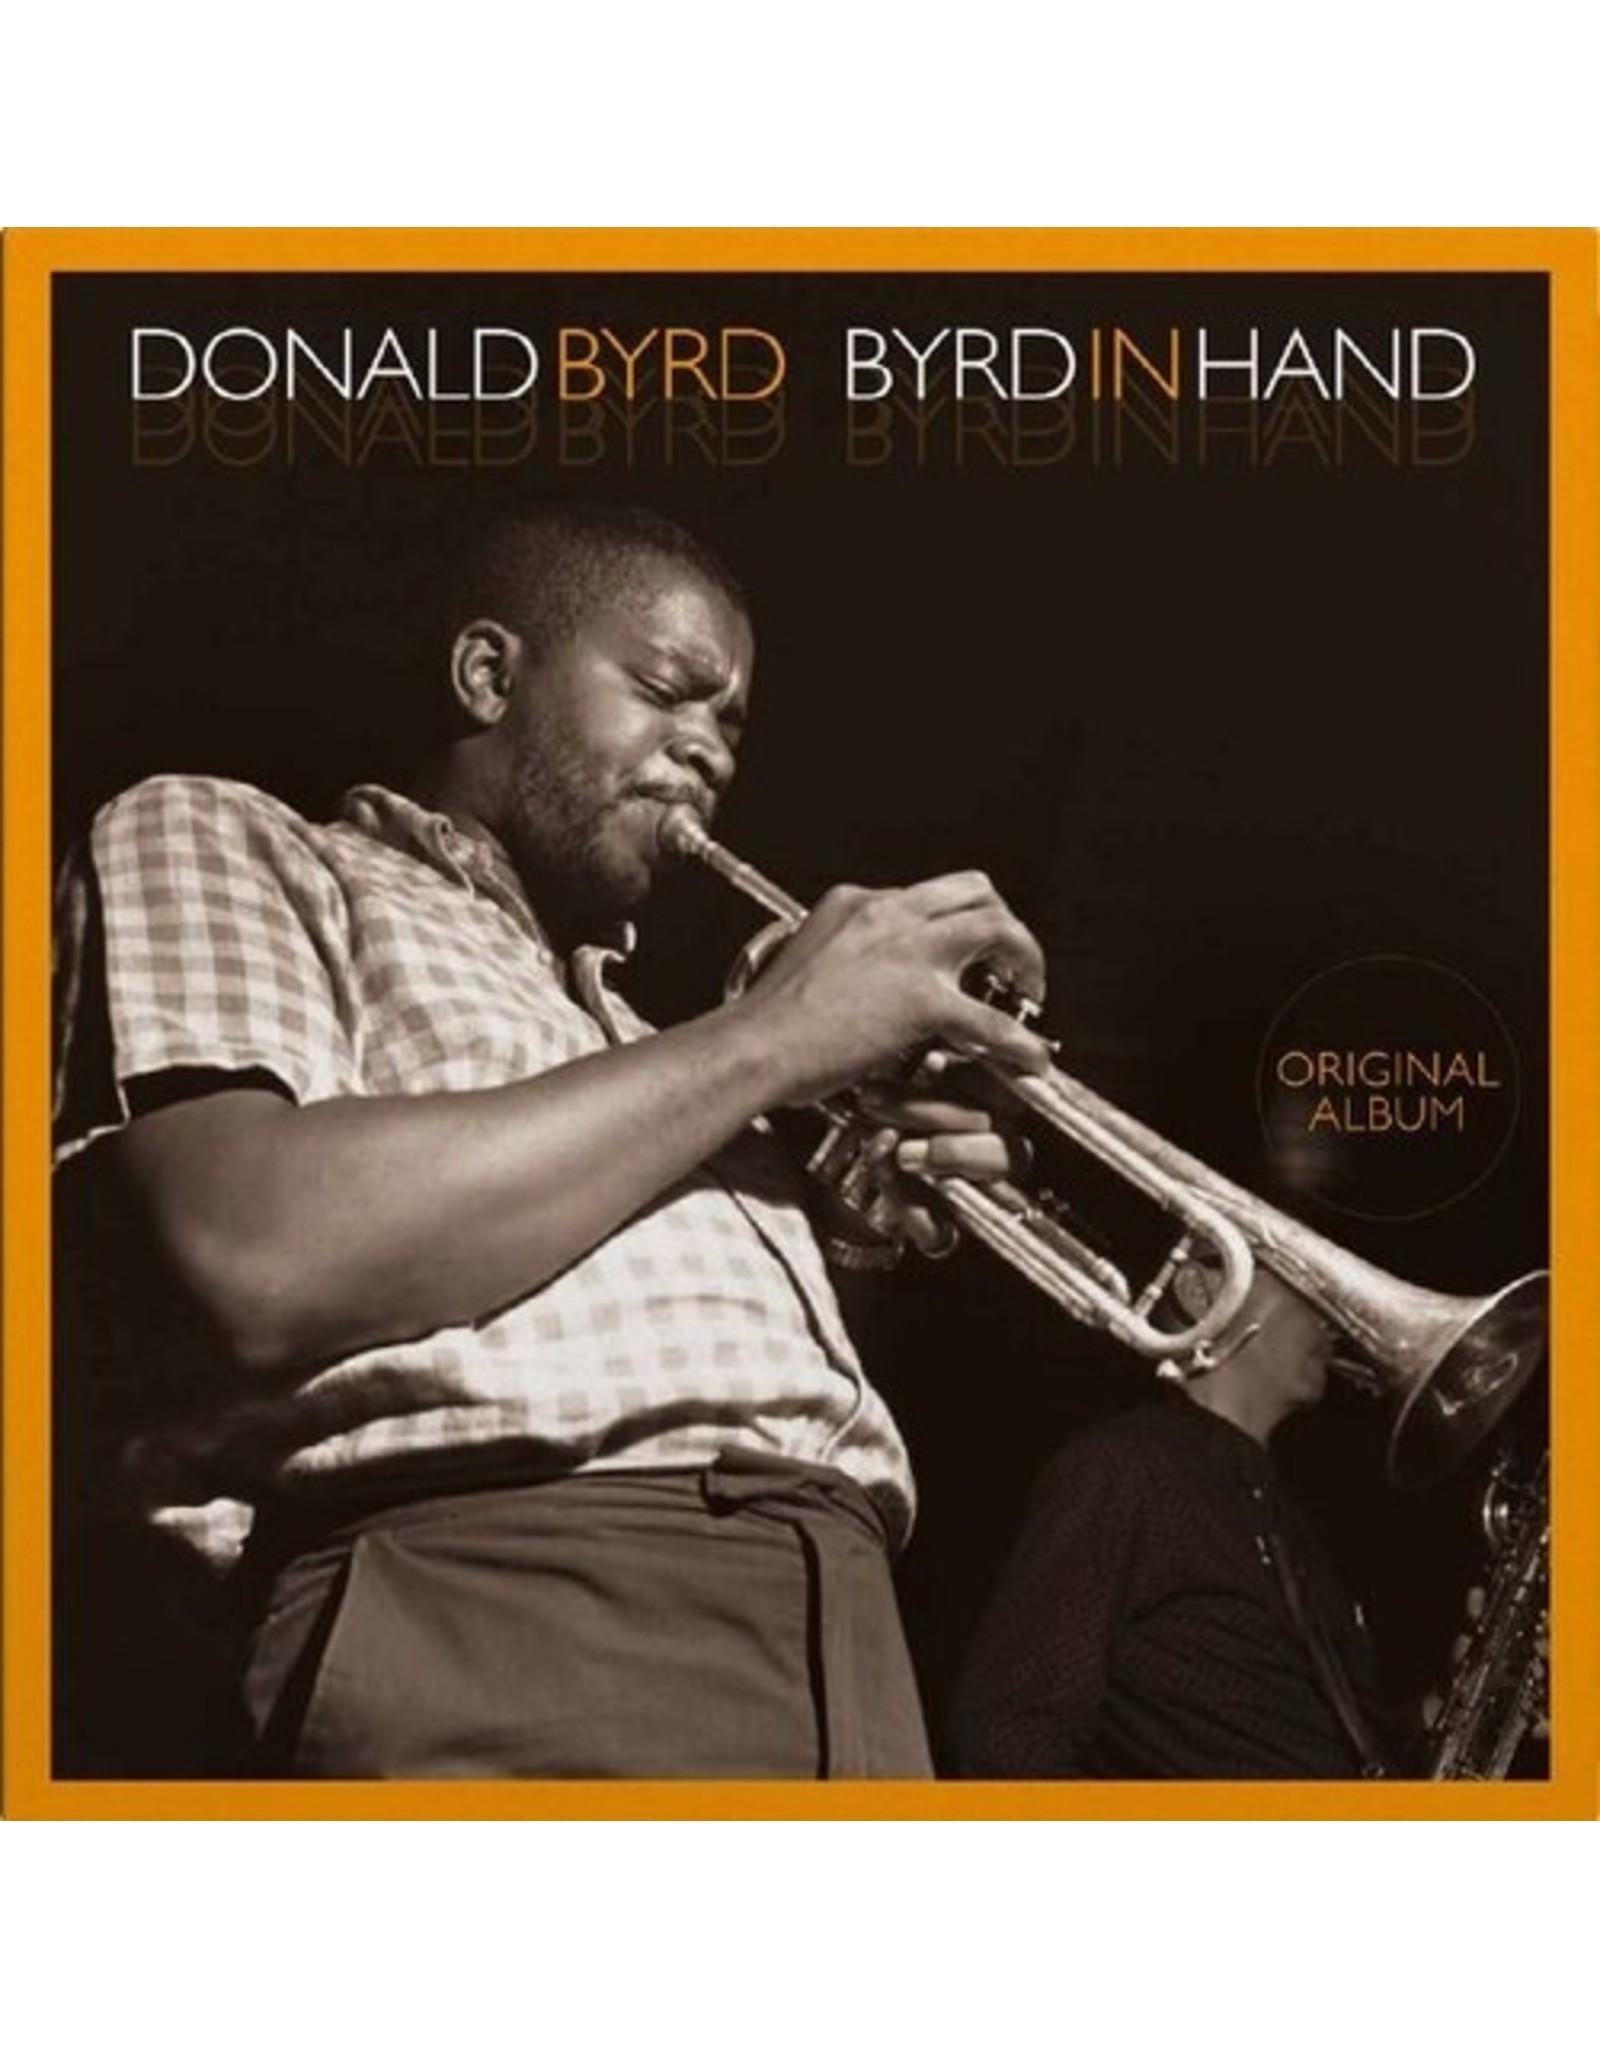 New Vinyl Donald Byrd - Byrd In Hand LP